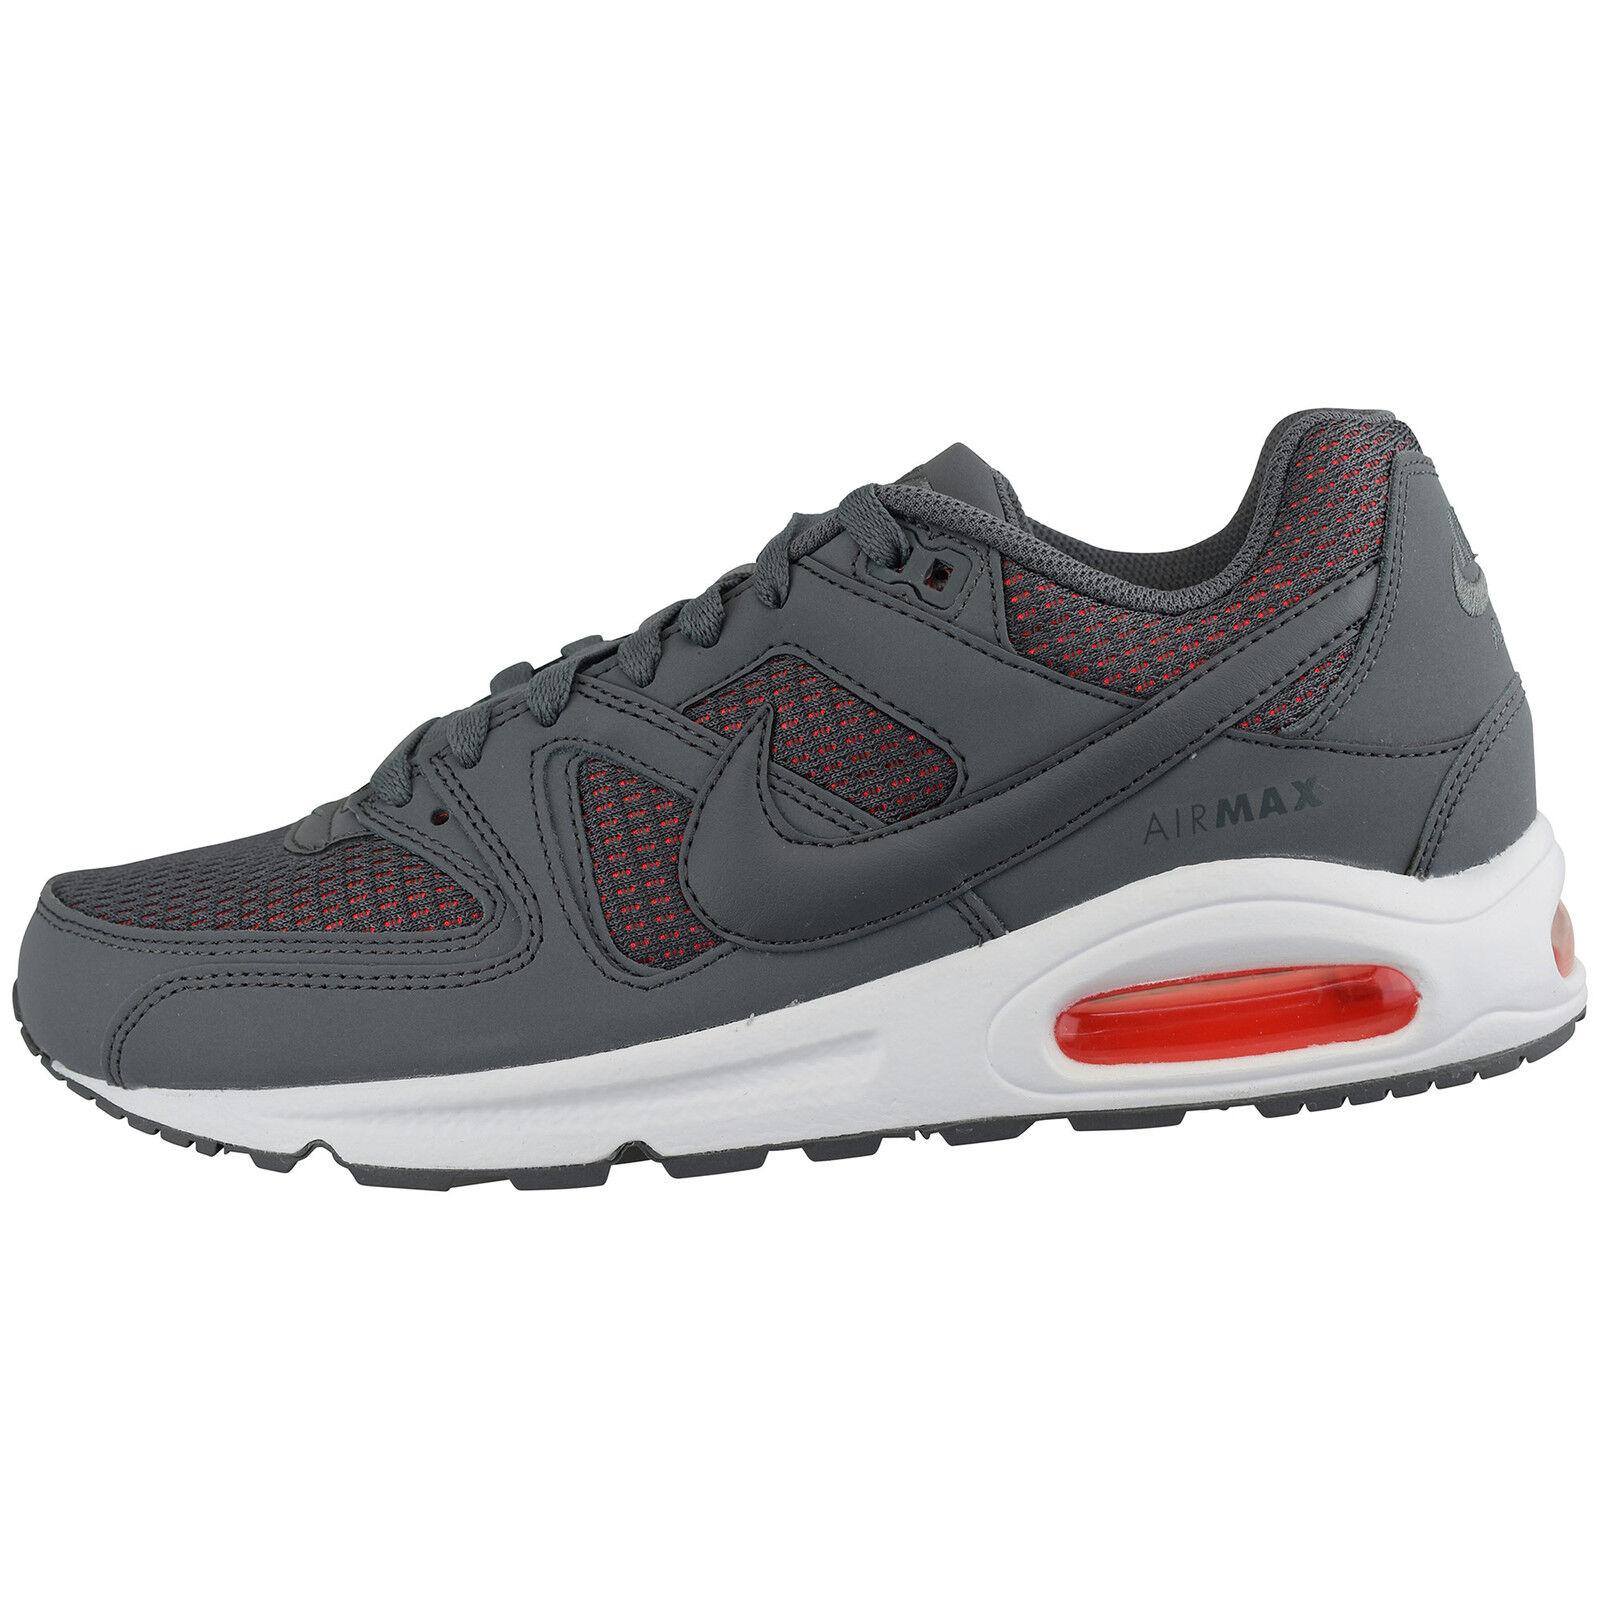 WMNS NIKE AIR MAX COMMAND 397690-020 LIFESTYLE Scarpe Running Uomo Sneaker Running